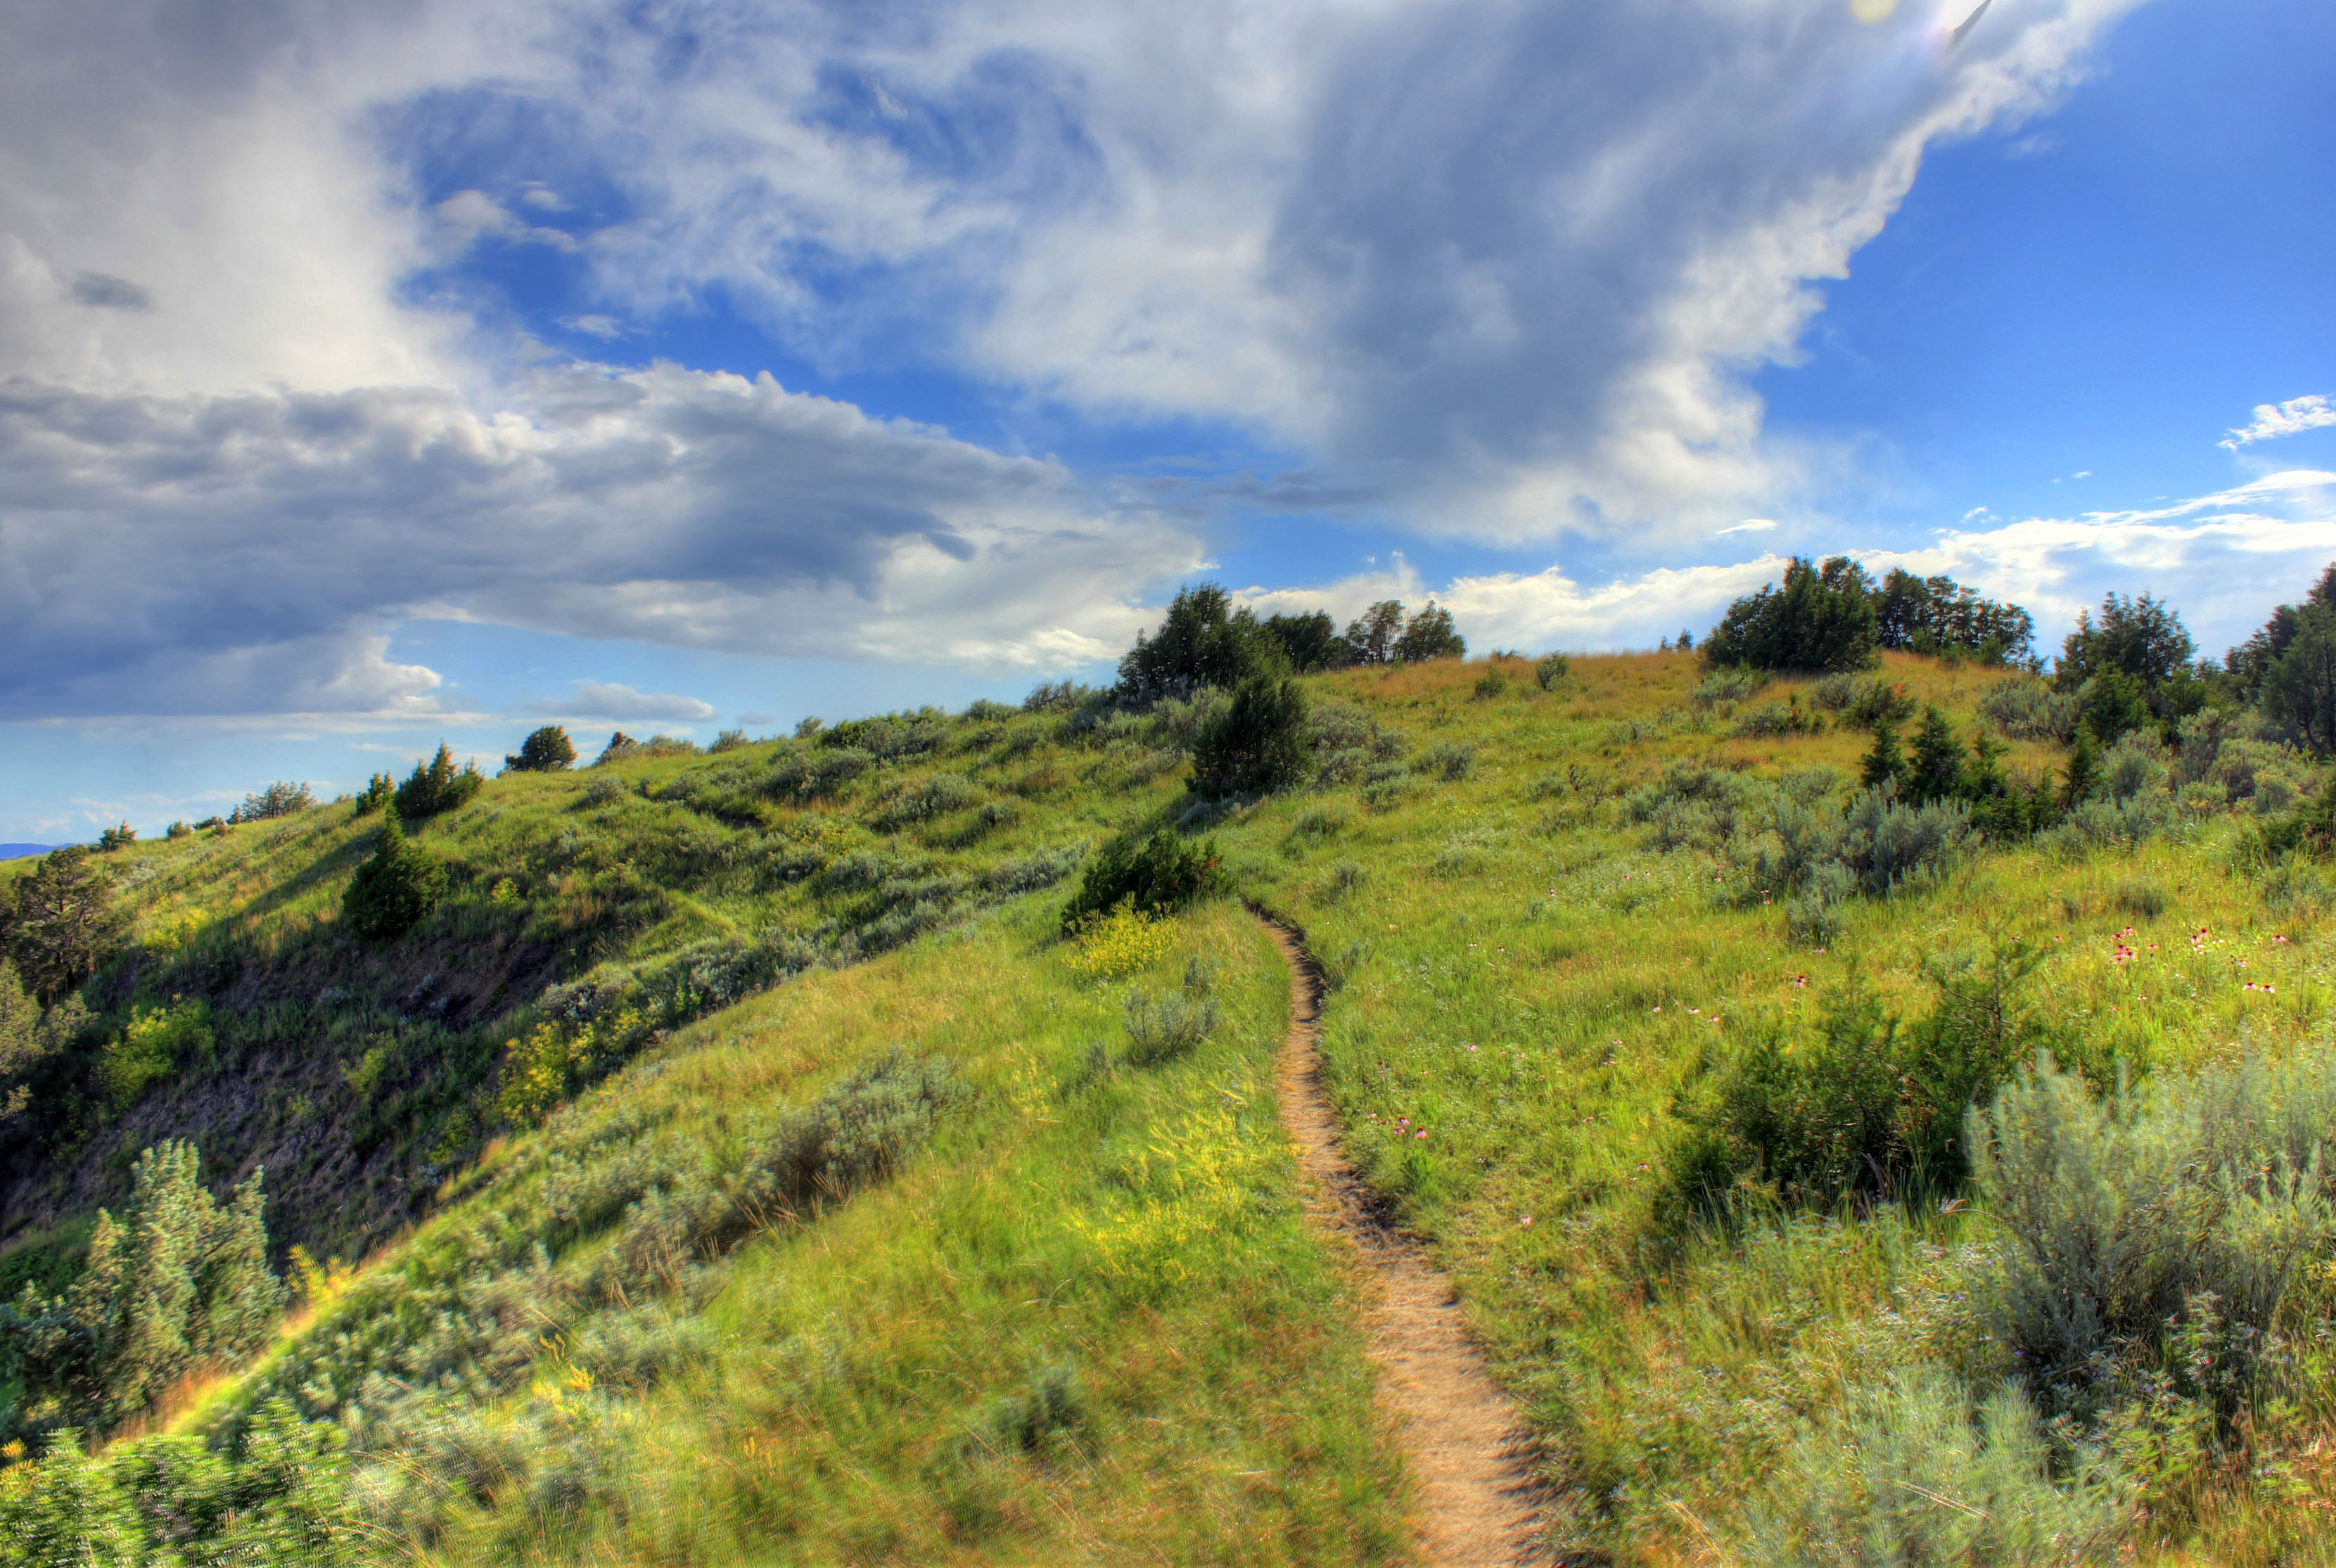 Hiking path at Theodore Roosevelt National Park, North Dakota.